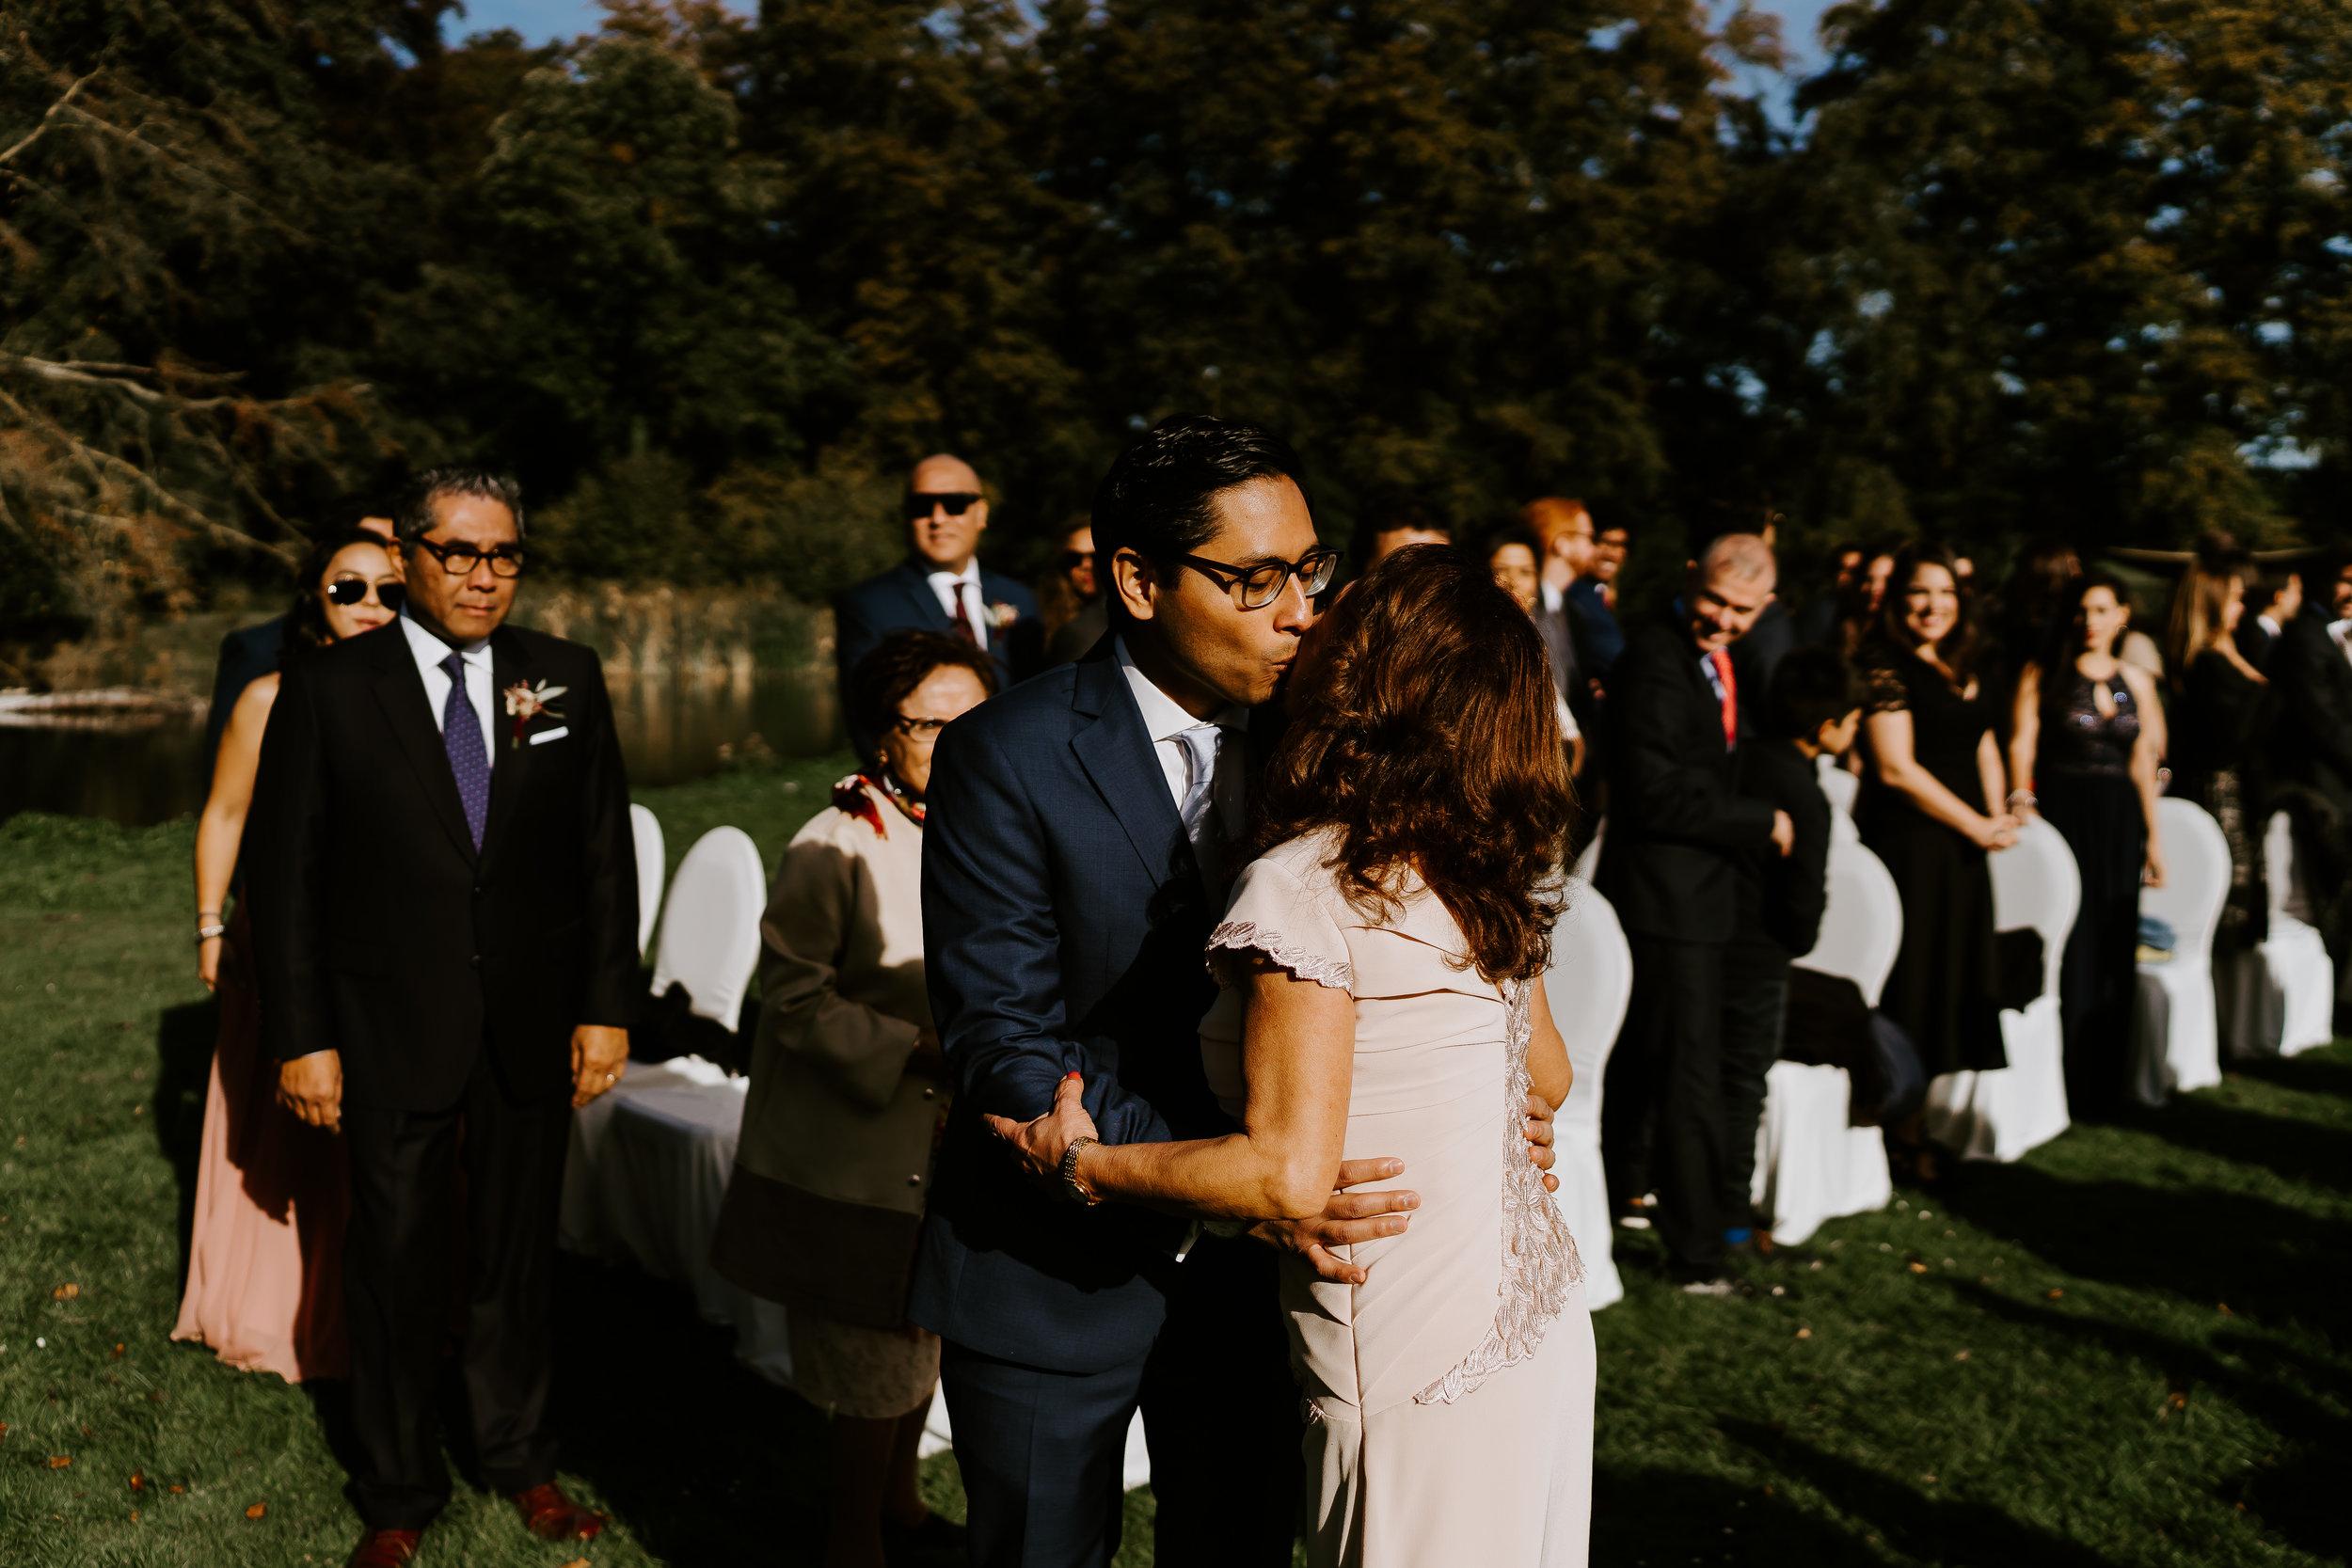 bruiloft-altembrouck-overthemoonweddings30.jpg